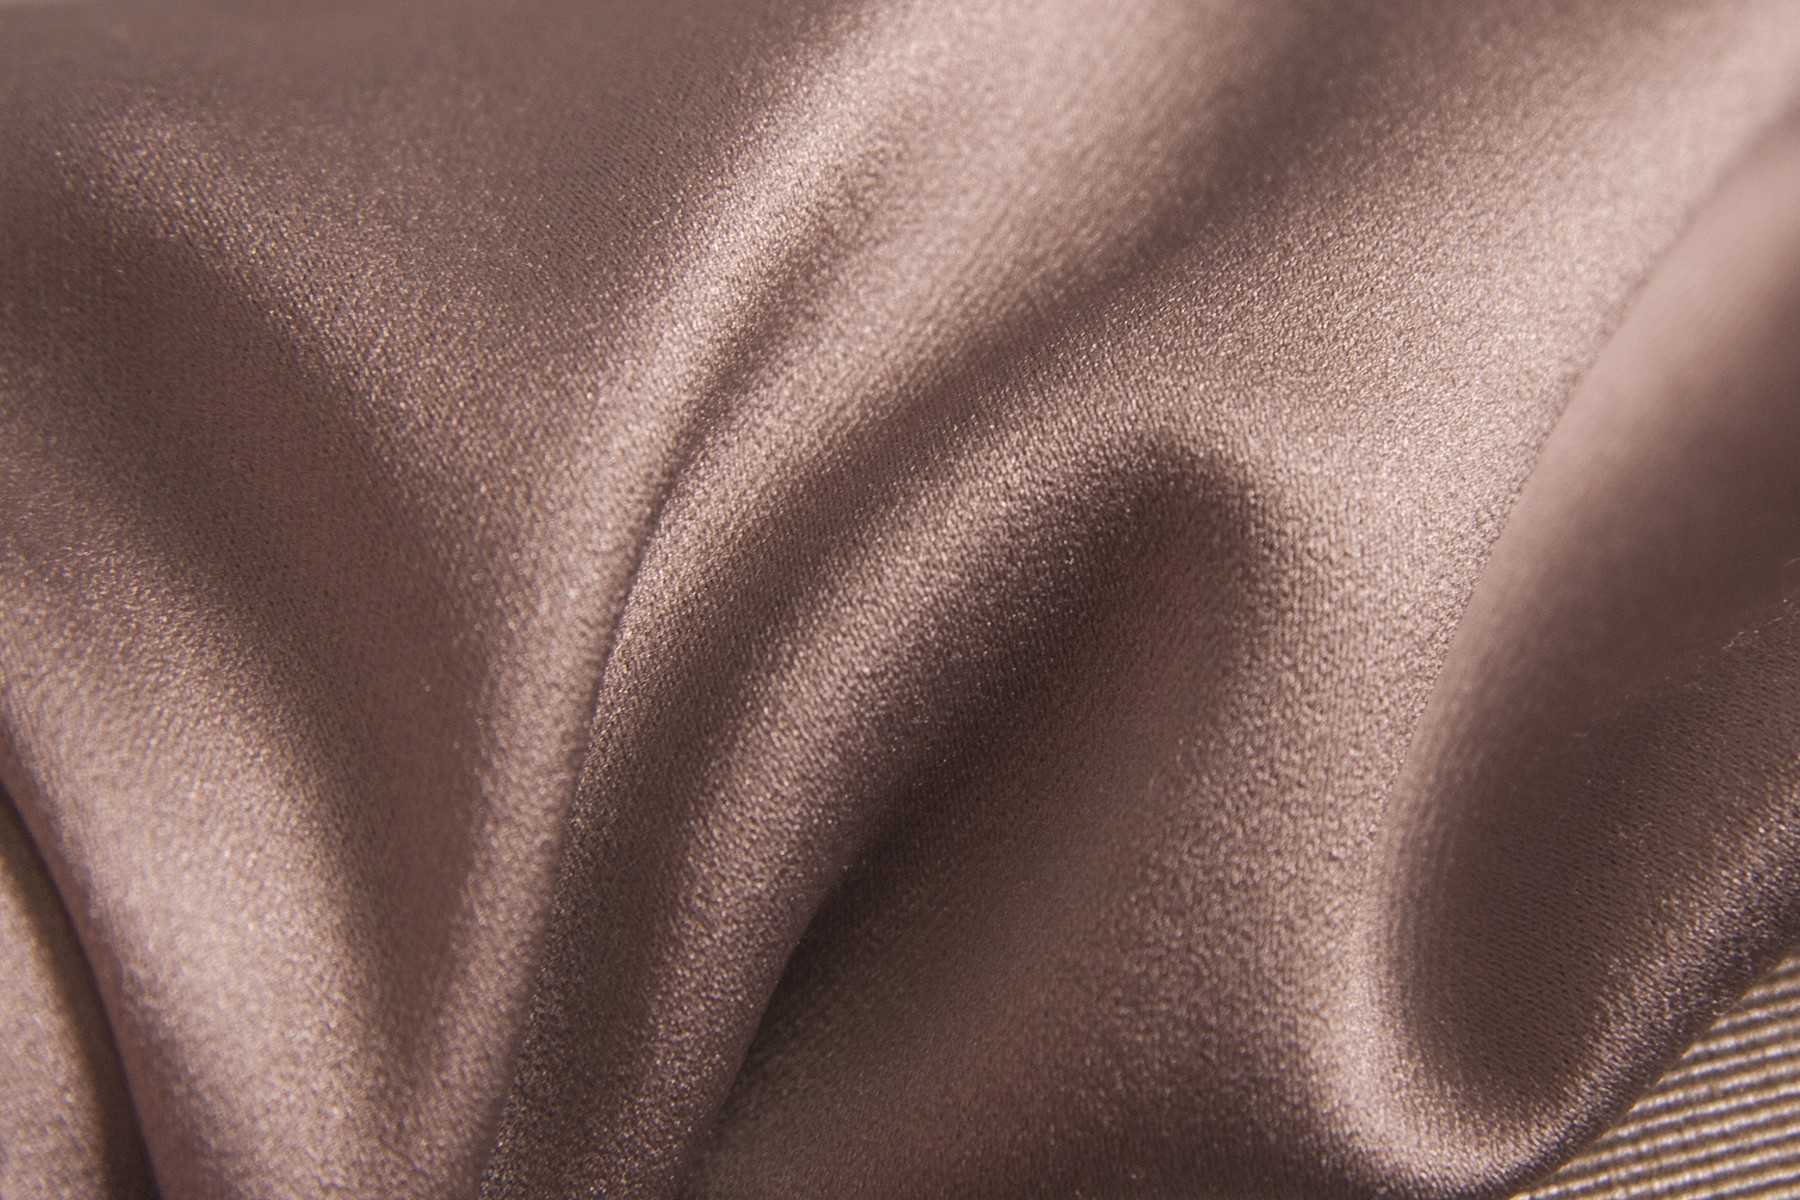 Світлонепроникна тканина блекаут (blackout) 340378b314fdc